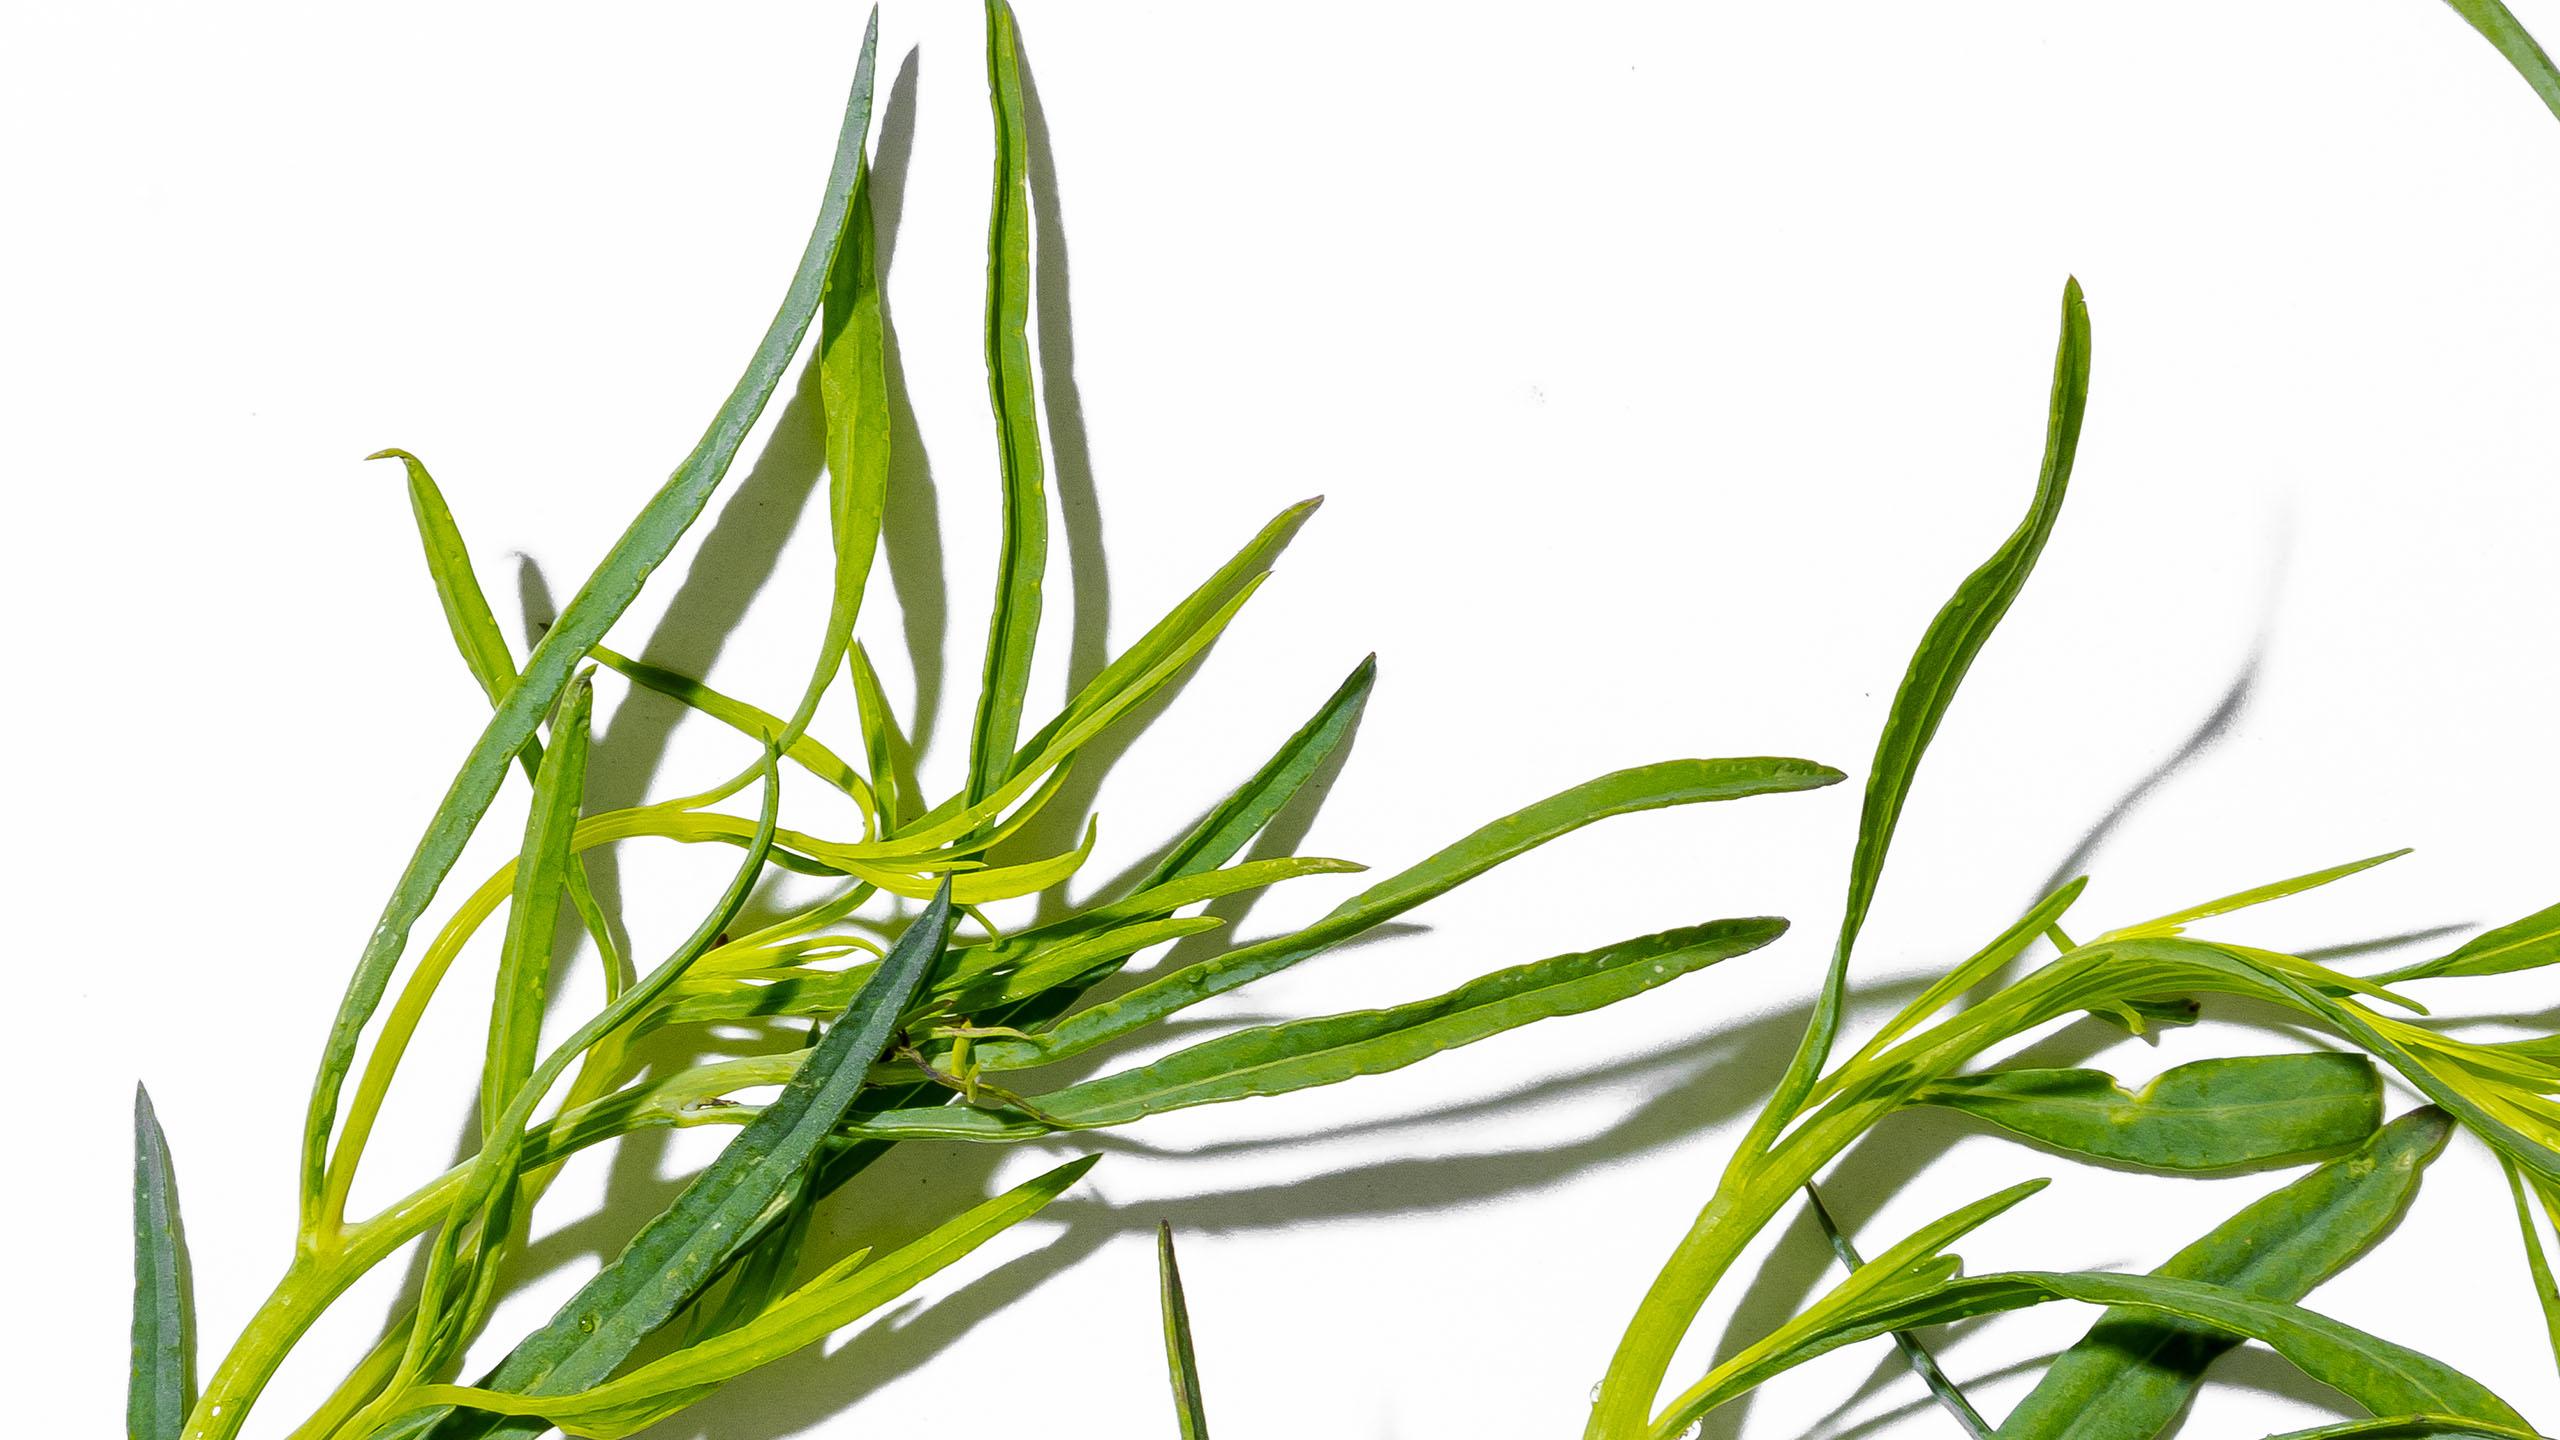 chepil, hierbas frescas